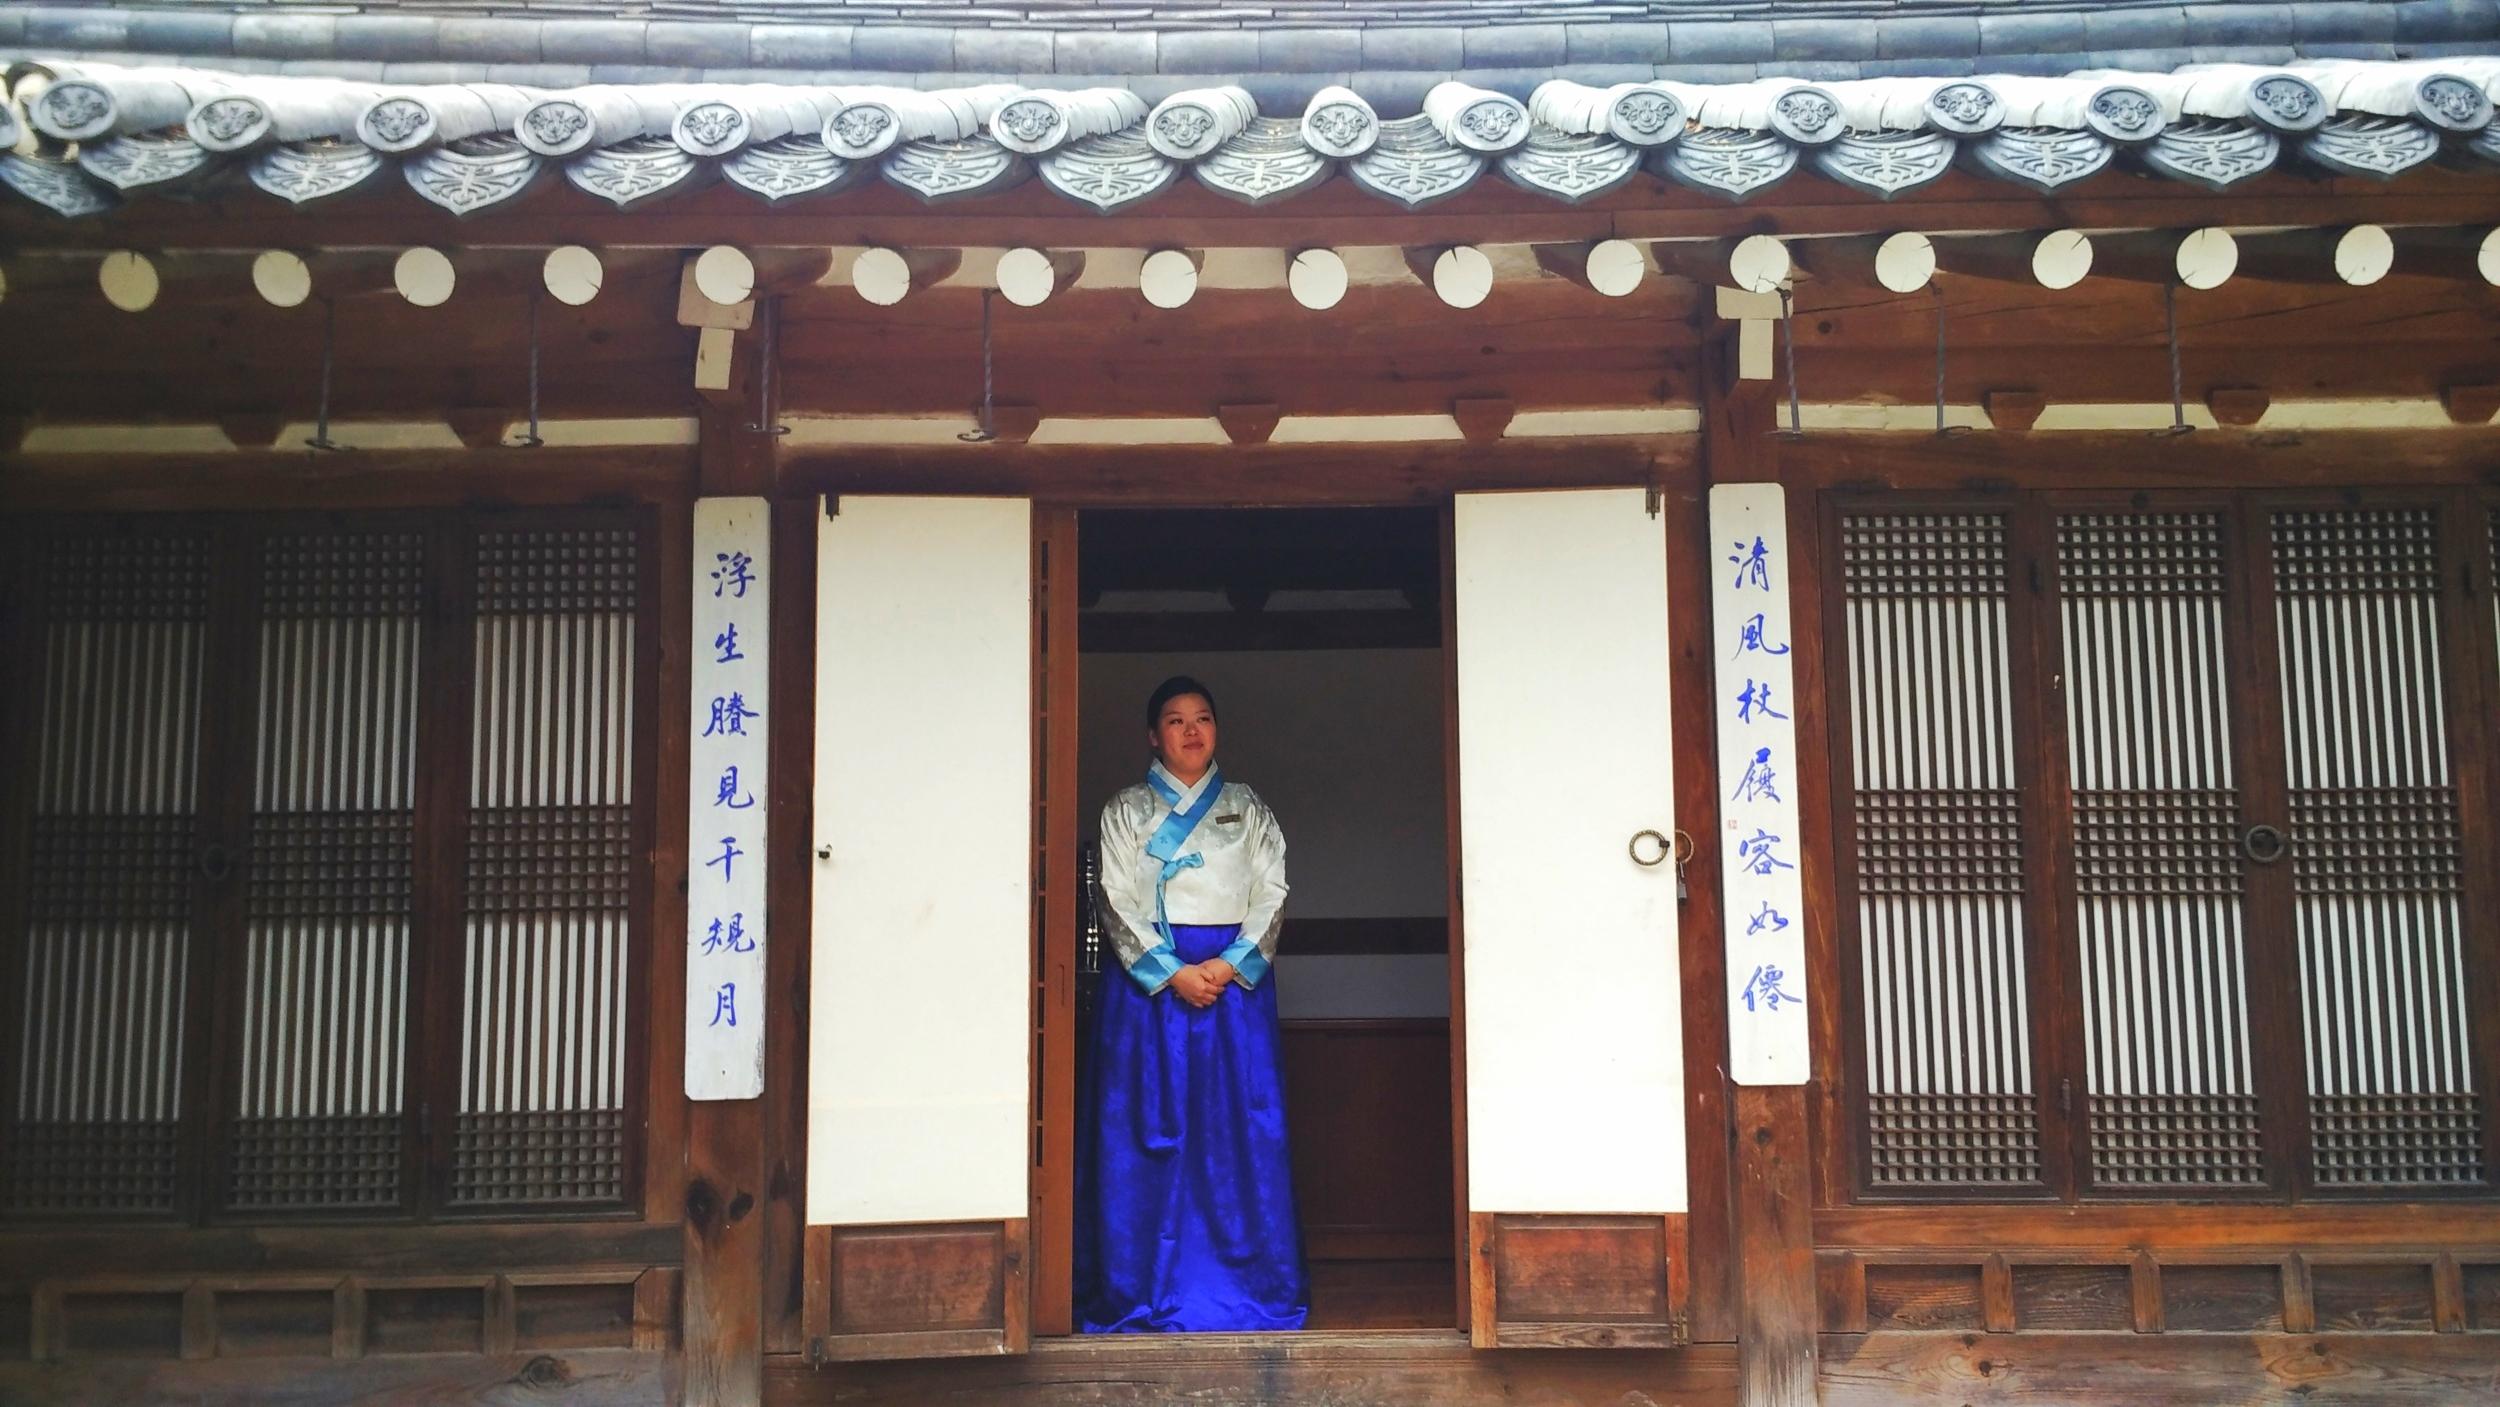 Lady in Hanbok, Korea House